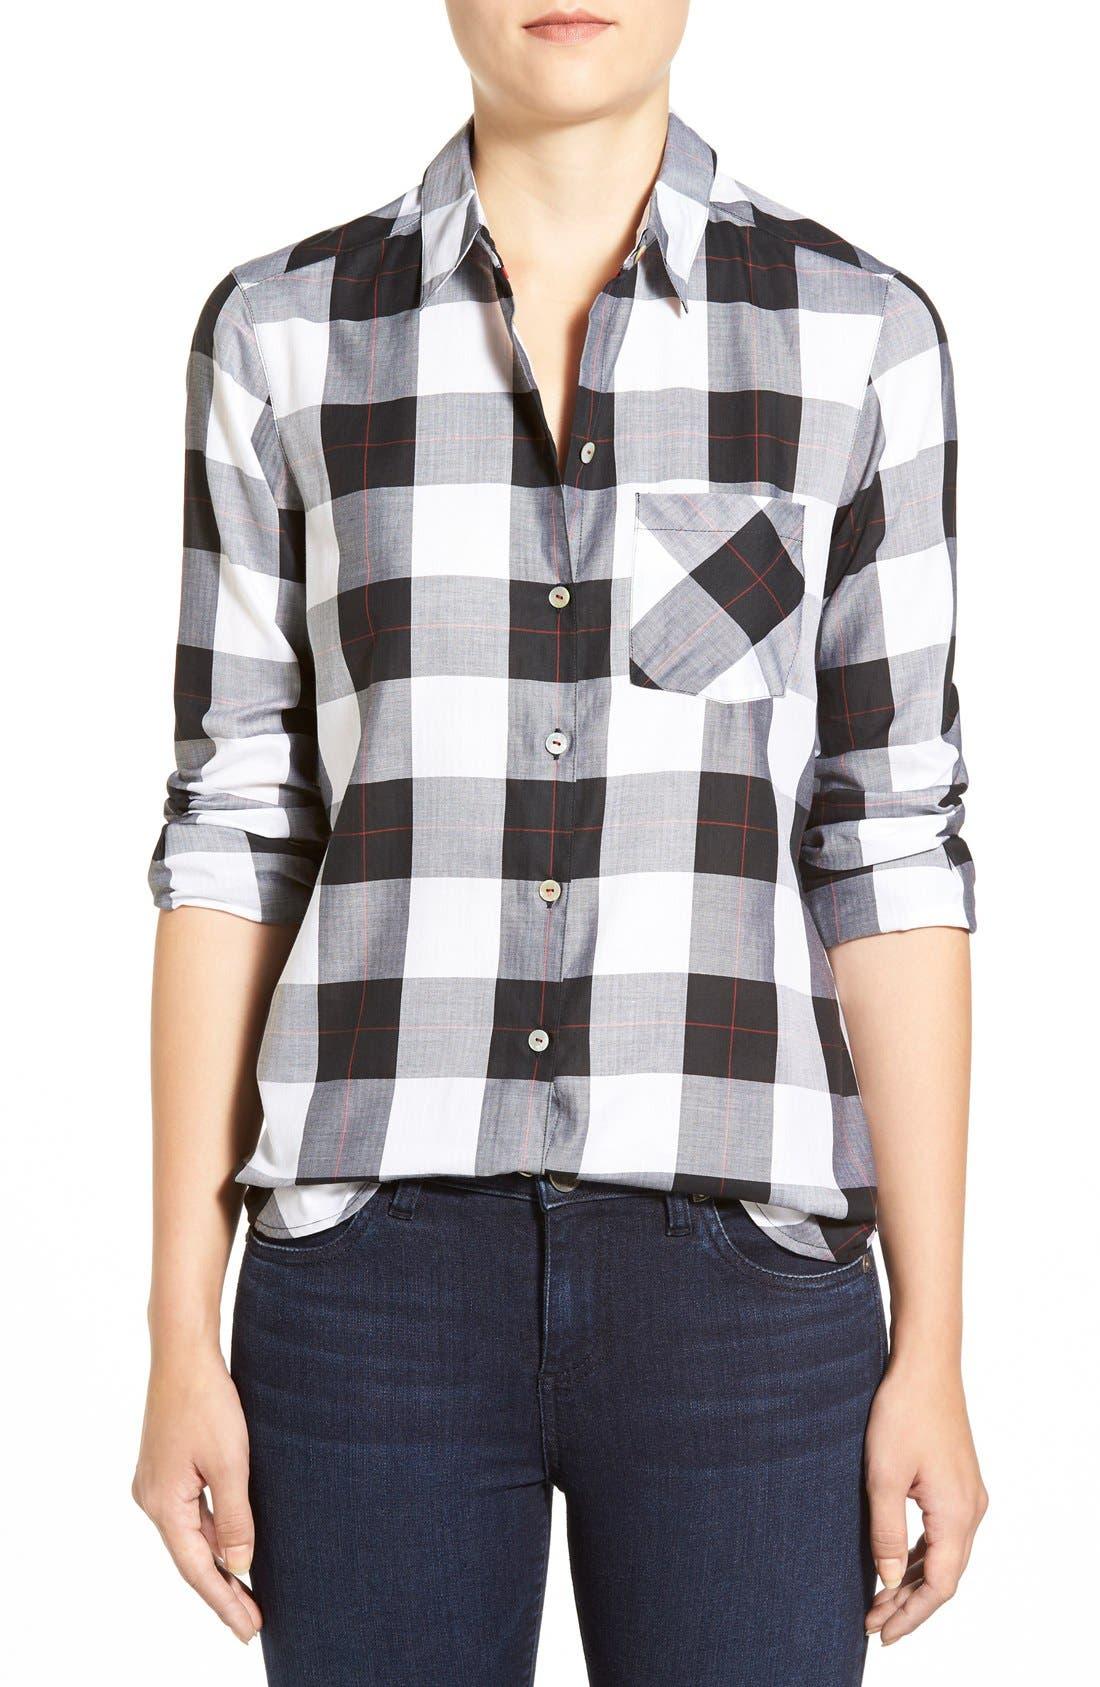 Alternate Image 1 Selected - Foxcroft Herringbone Buffalo Check Shirt (Regular & Petite)